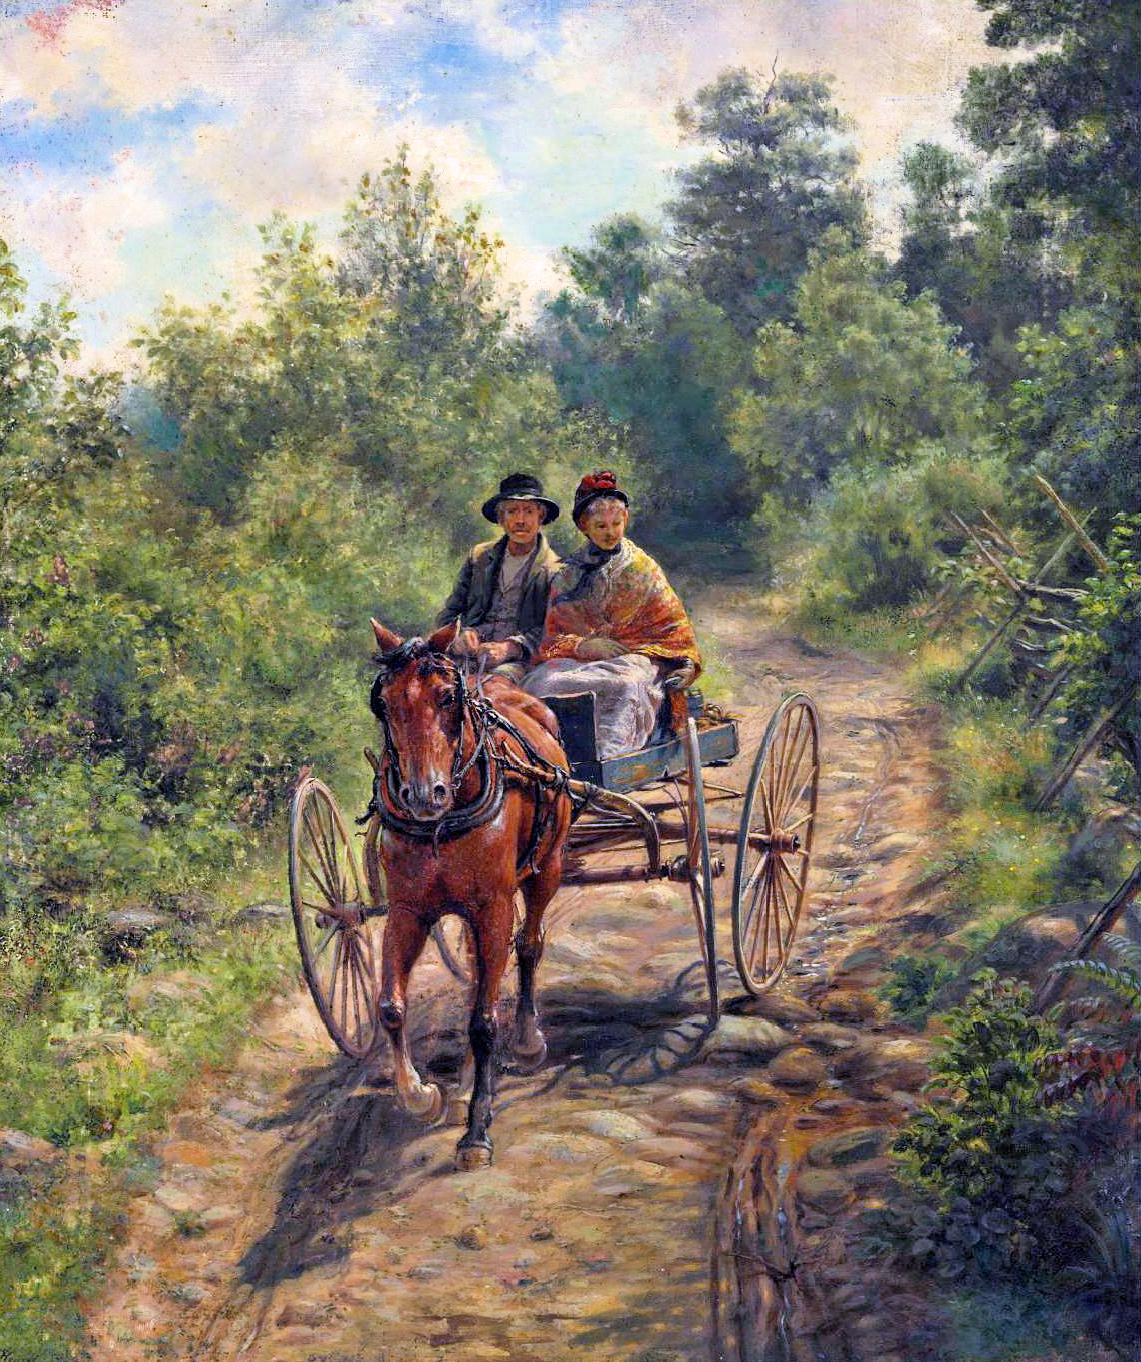 19th century American Paintings: Edward Lamson Henry